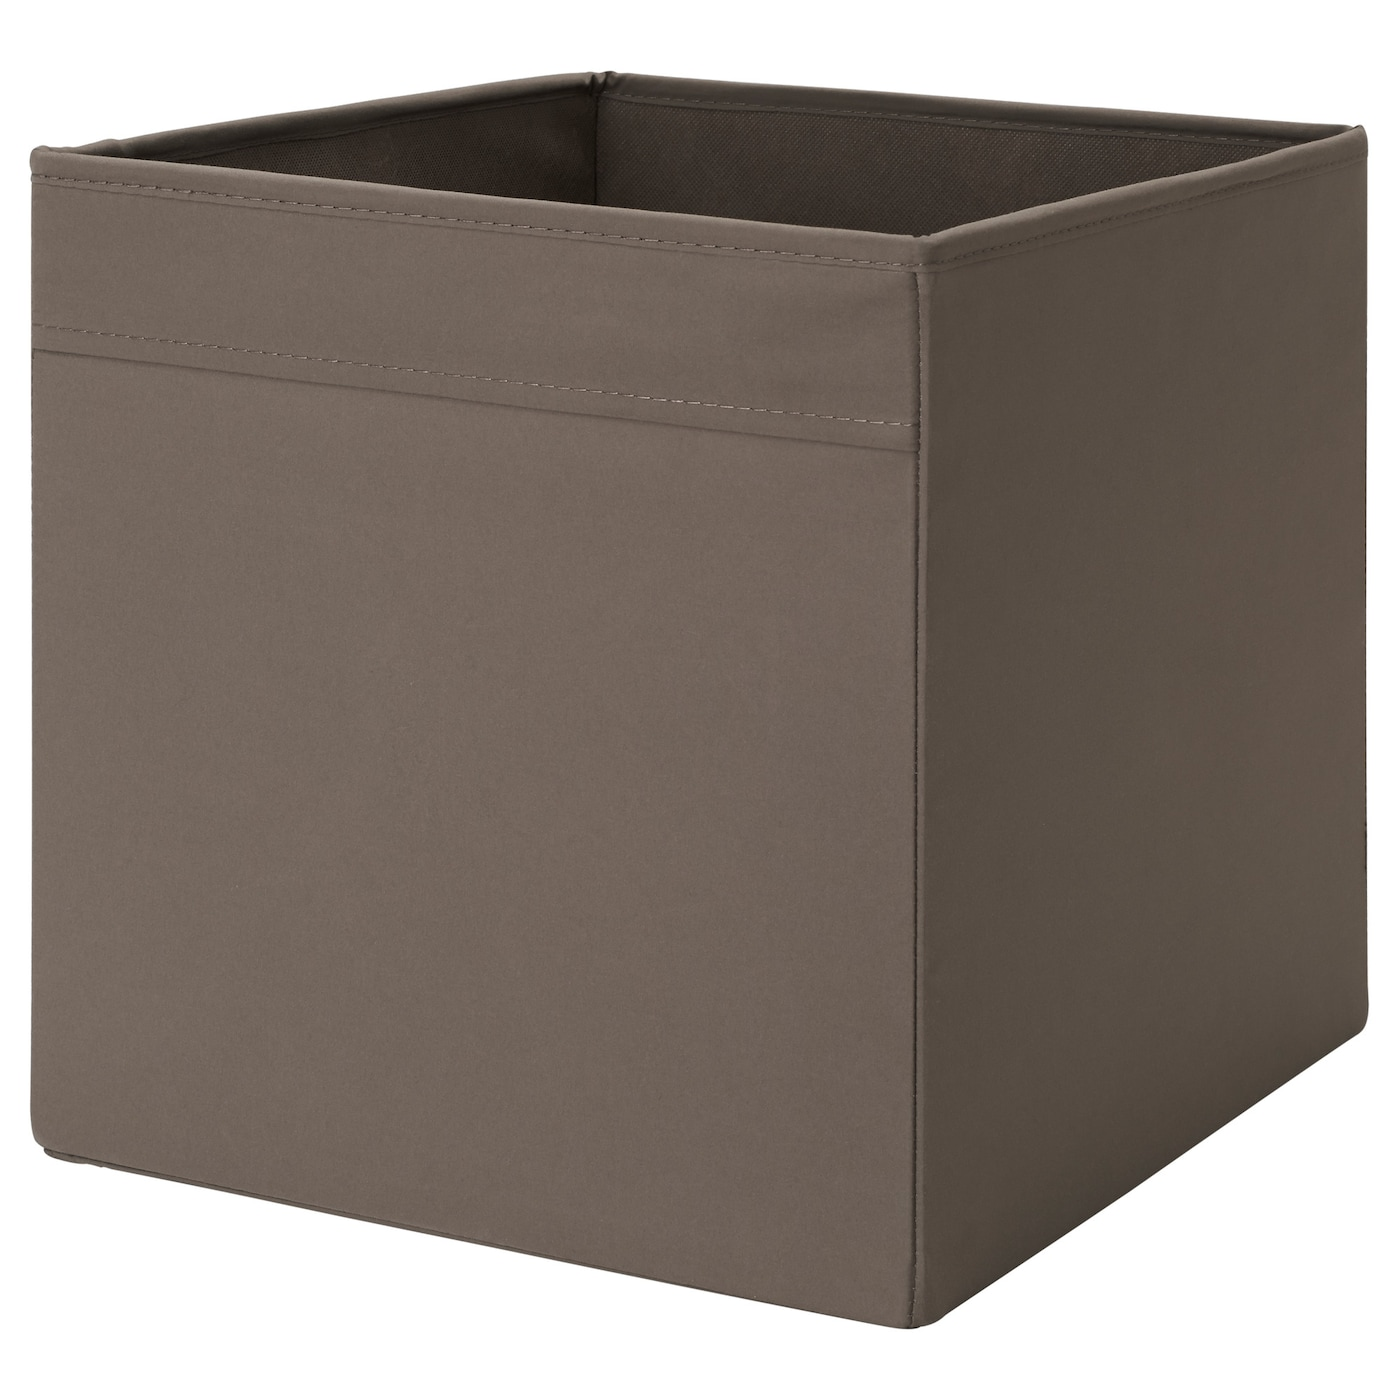 dr na rangement tissu brun 33x38x33 cm ikea. Black Bedroom Furniture Sets. Home Design Ideas